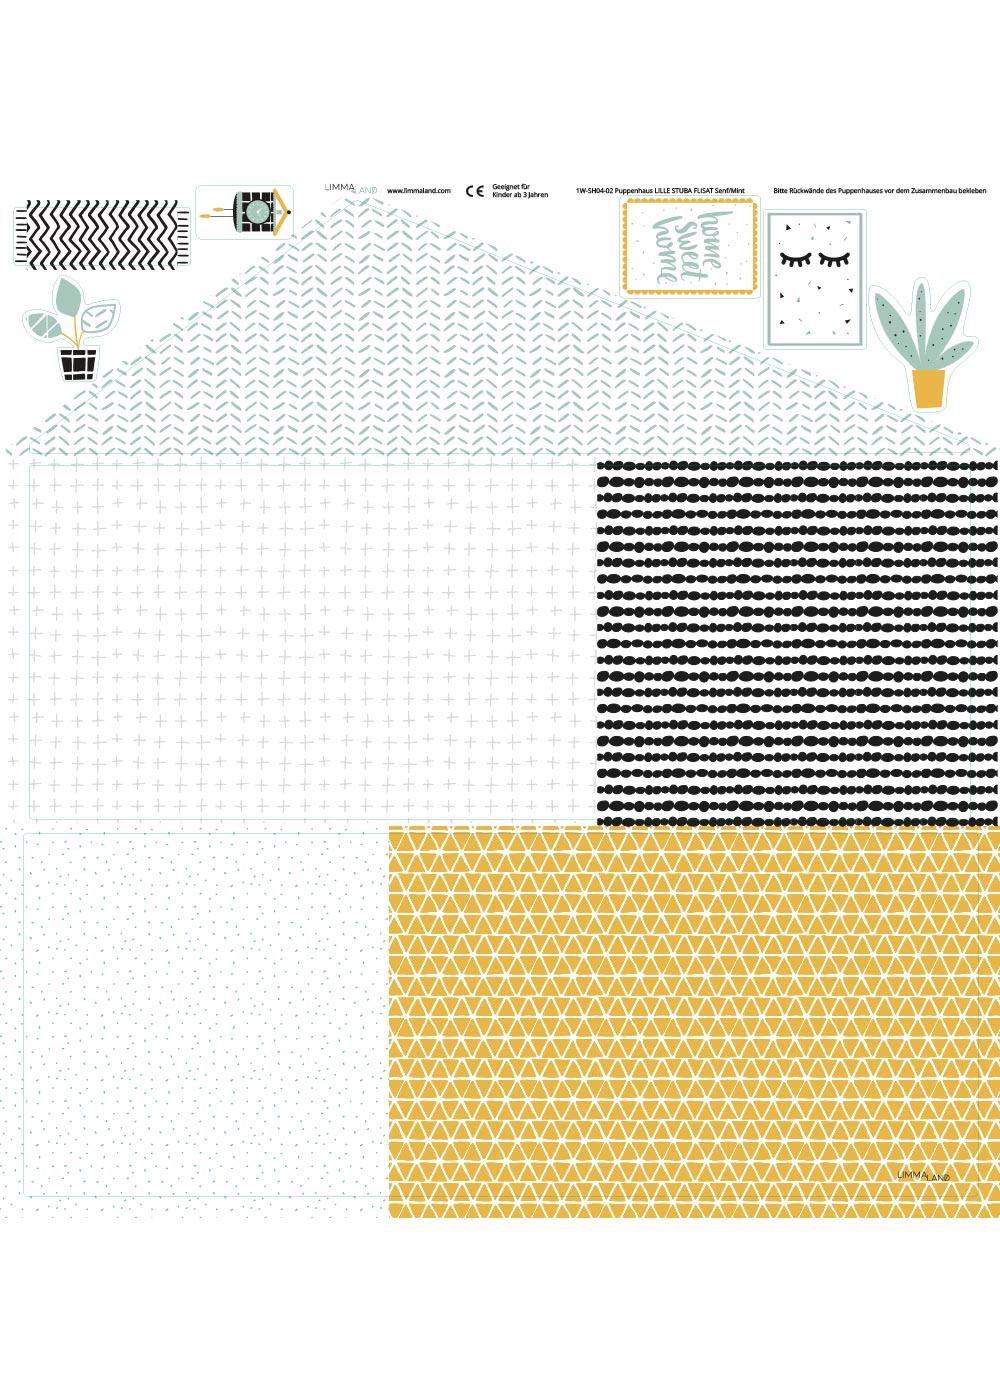 Ikea Flisat Puppenhaus Tapete Lille Stuba mint senf Druckvorlage